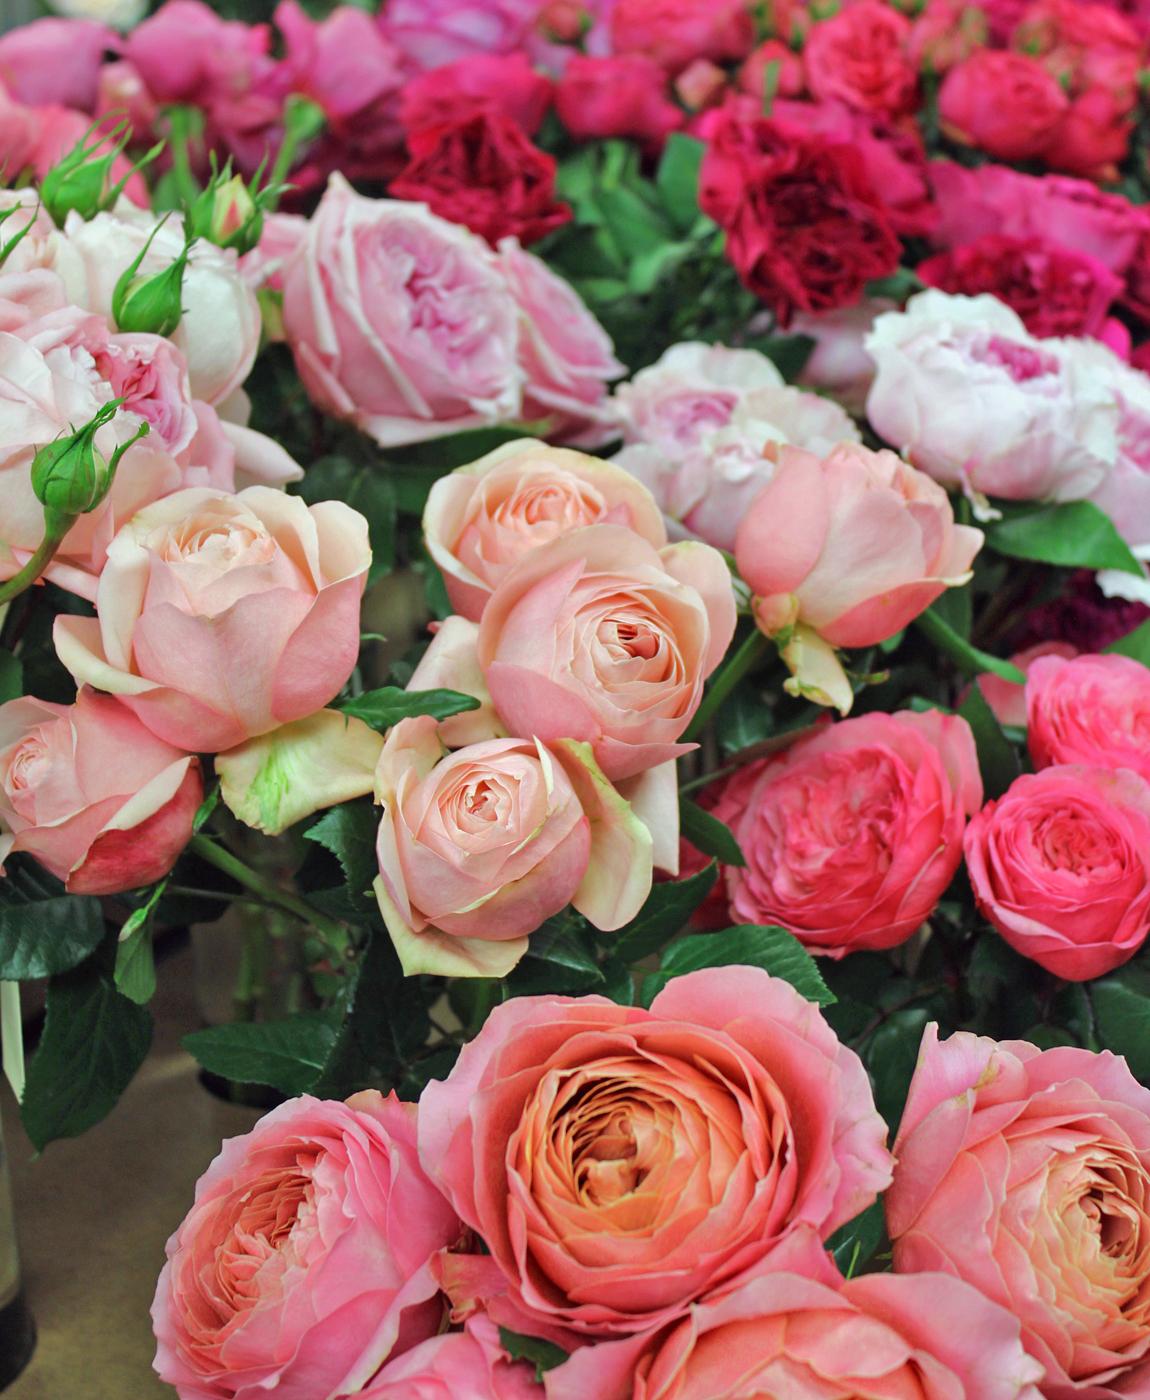 harvest-rose-2